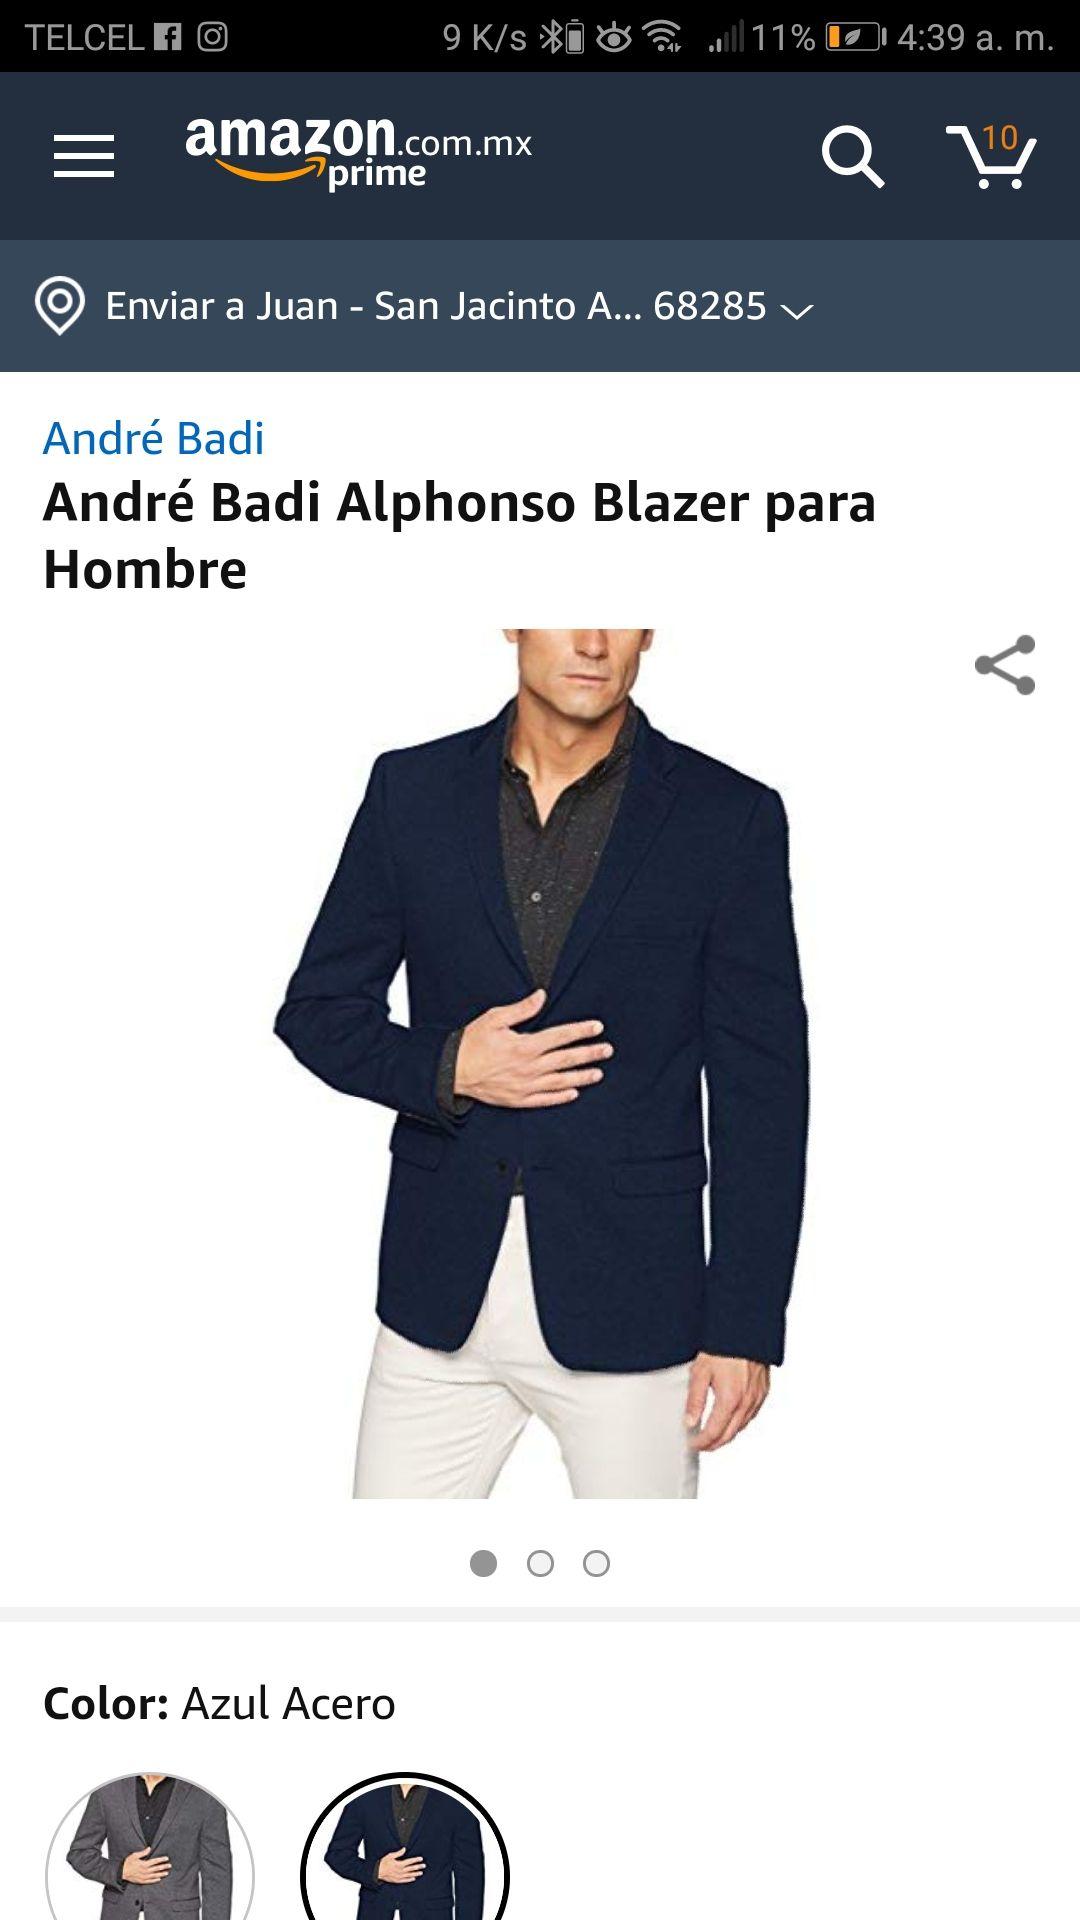 Amazon: André Badi Alphonso Blazer para Hombre